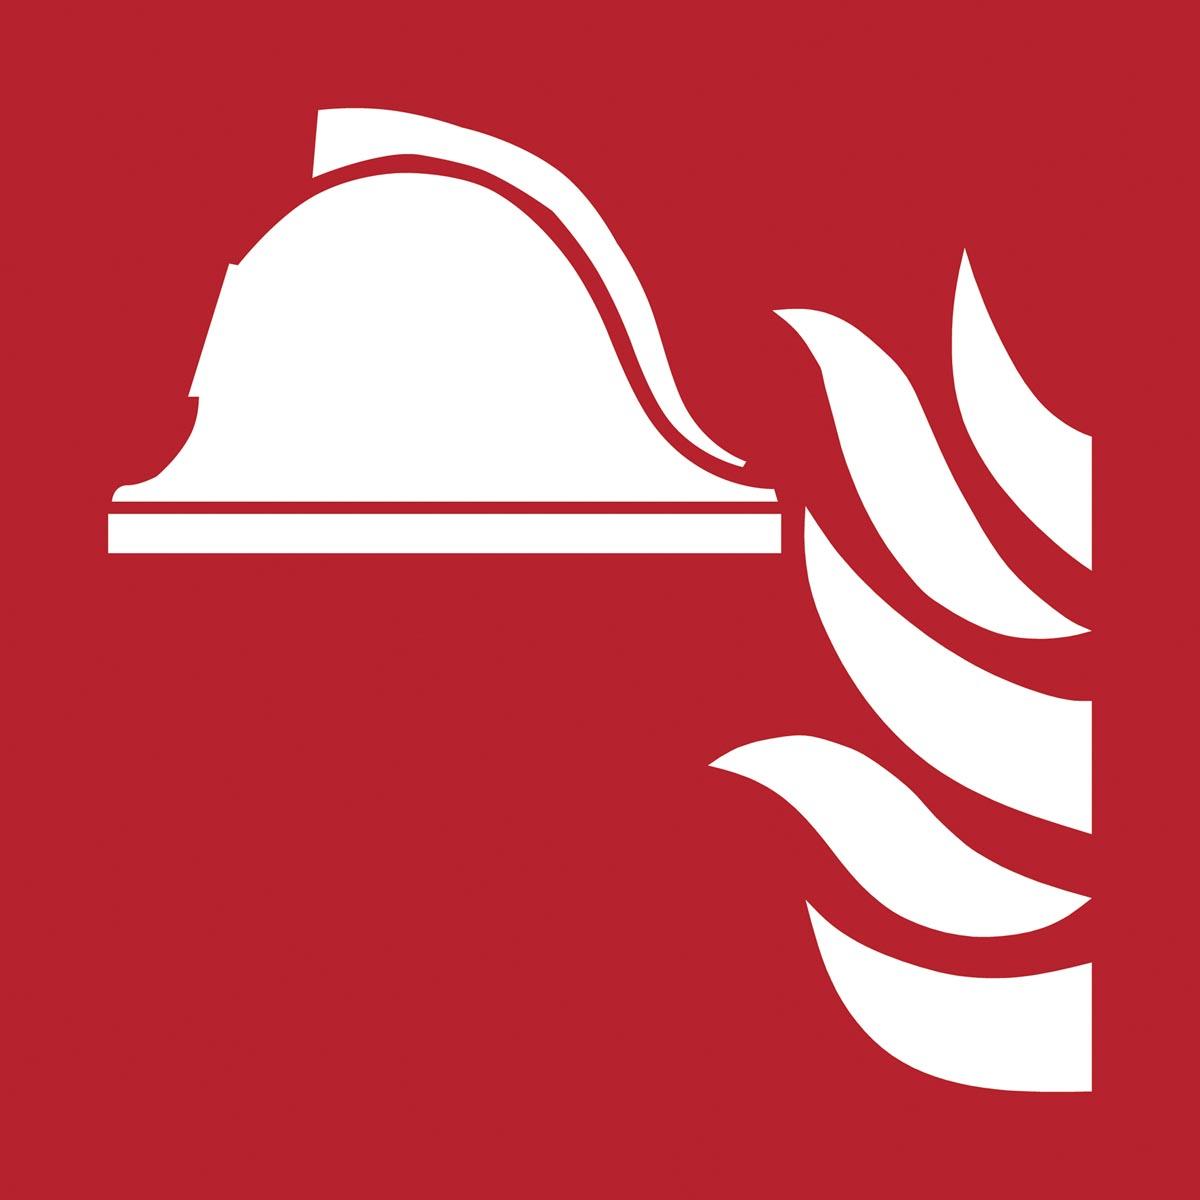 Tarifold brandveiligheidsbord uit PP, brandbestrijdingsmiddelen, ft 20 x 20 cm